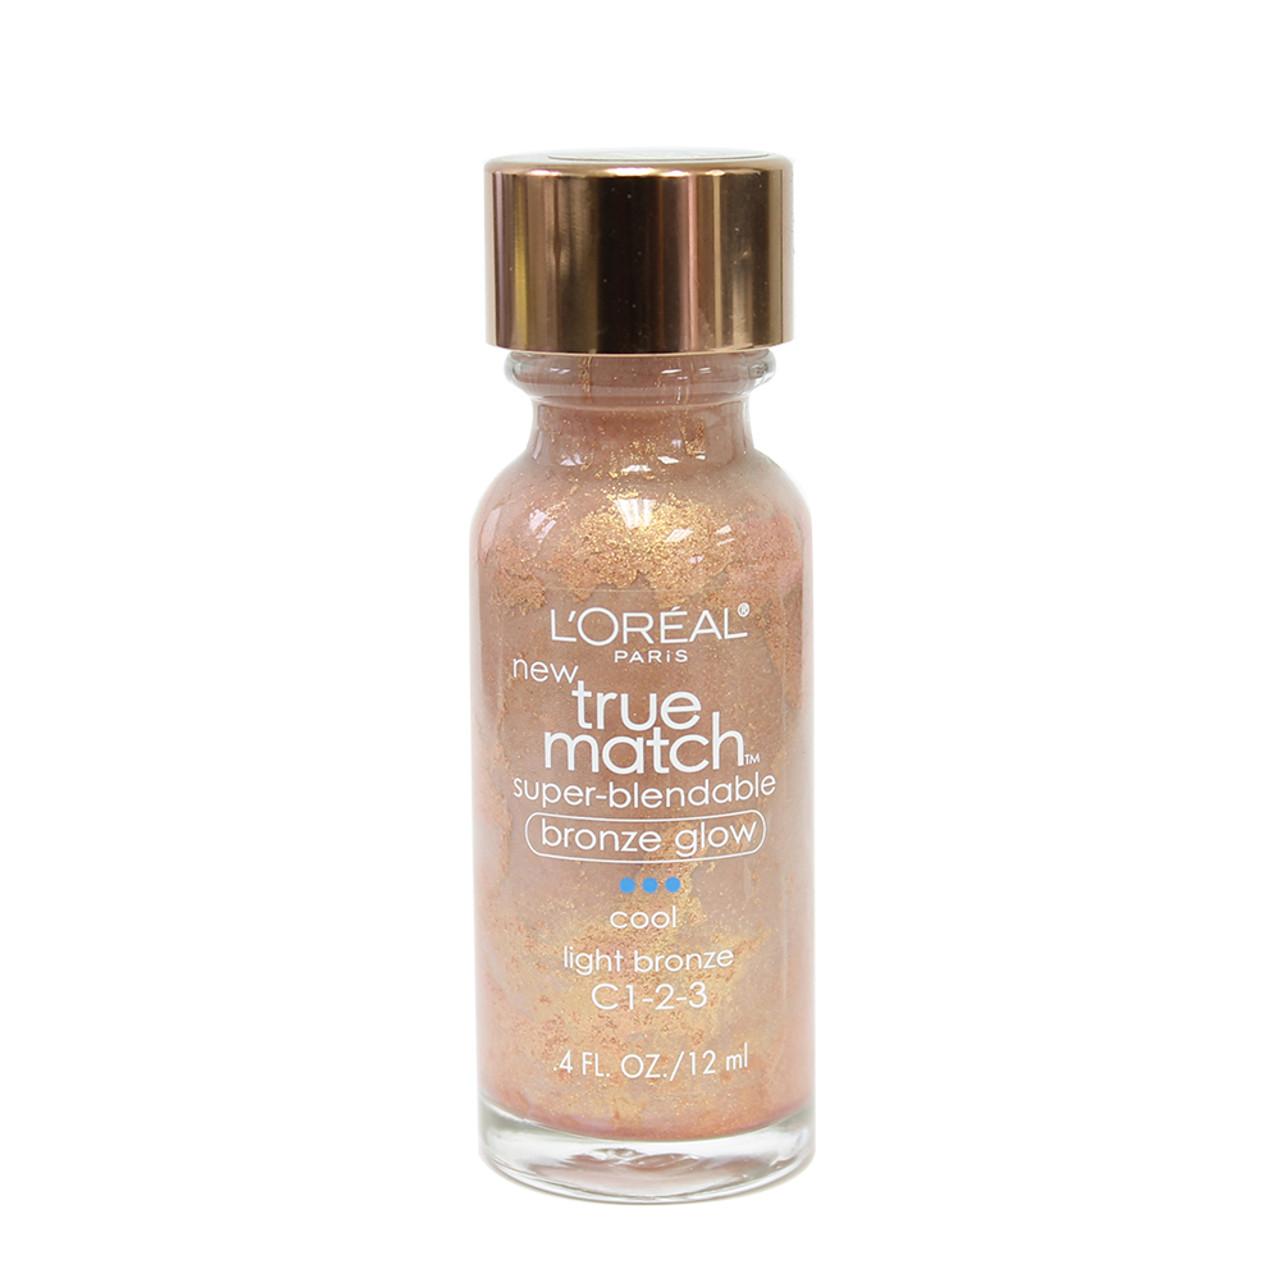 Loreal True Match Bronze Glow Super Blendable Makeup Perfecting Powder